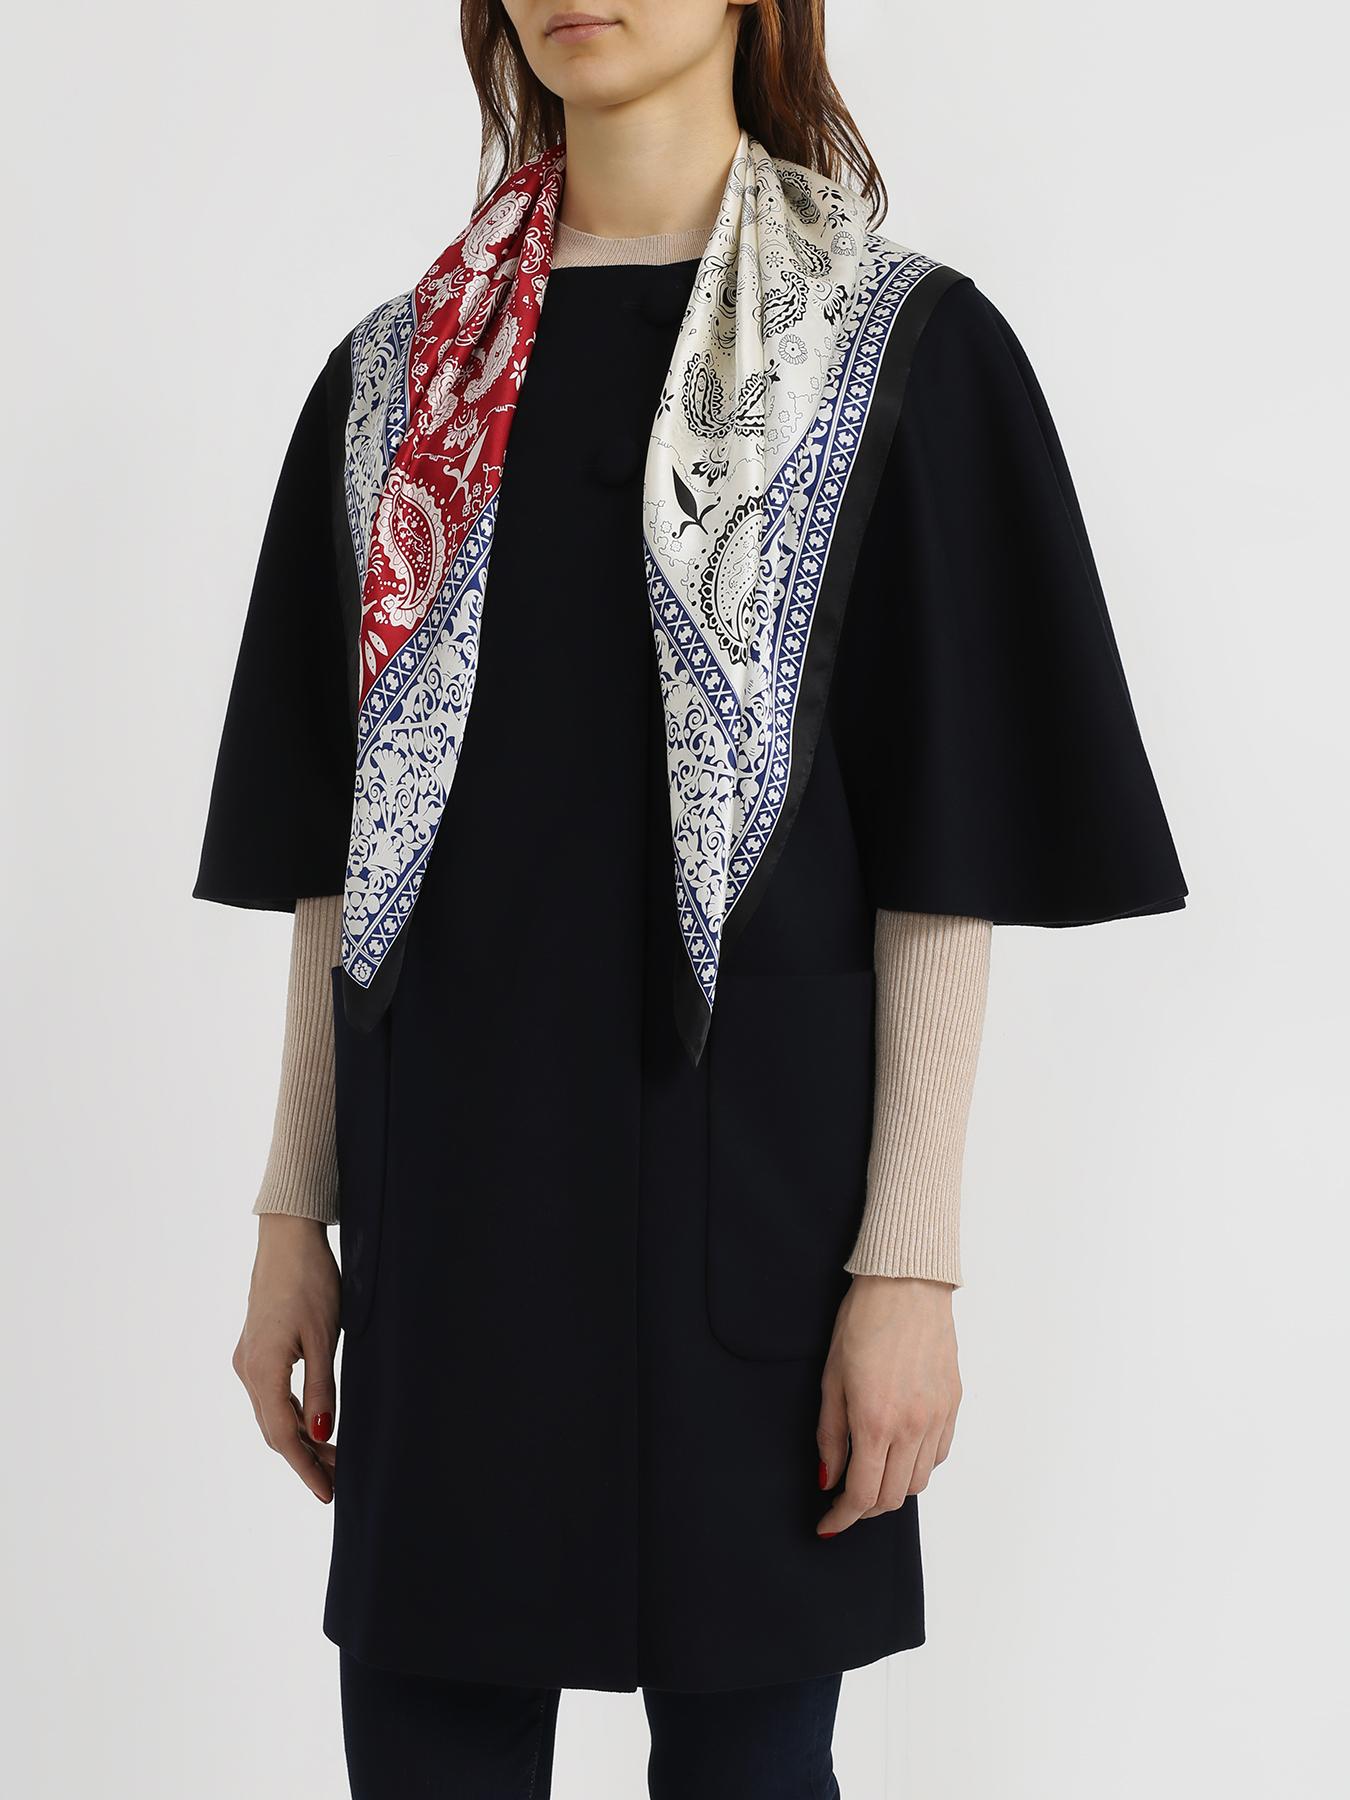 Платок Korpo Шелковый платок